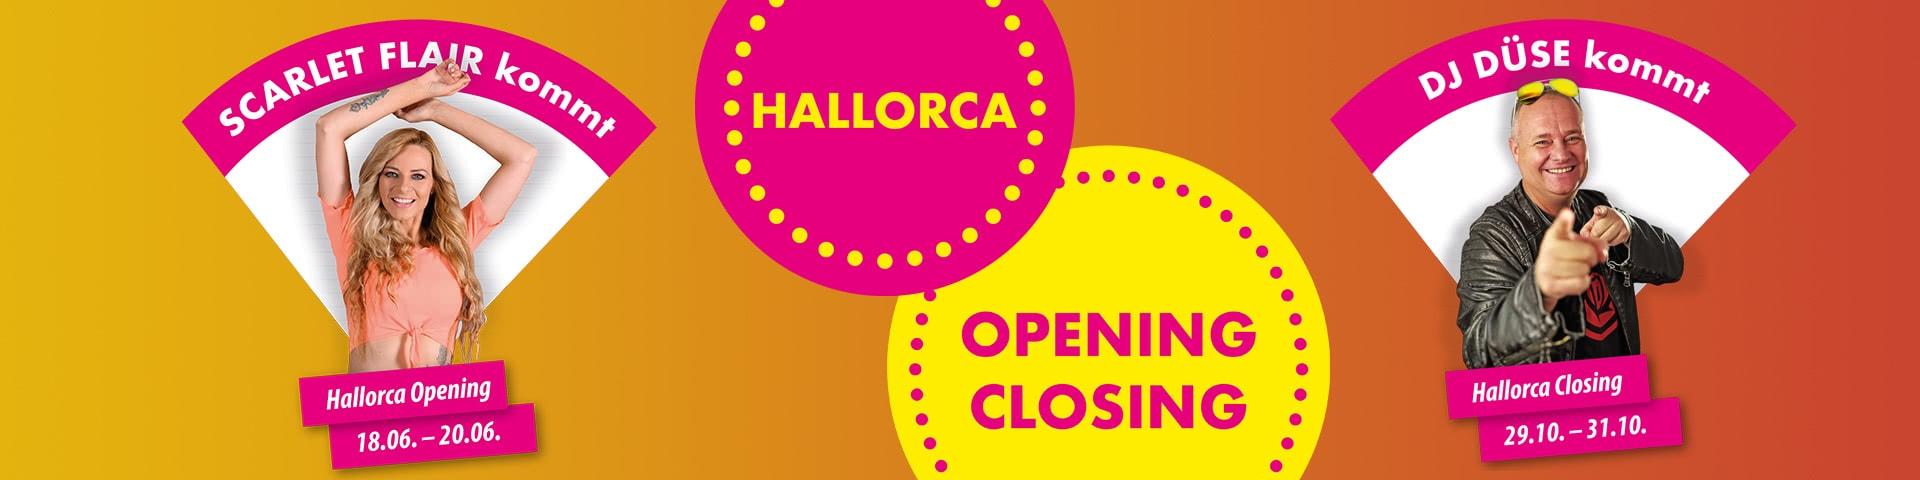 Hallorca Opening Closing mit Scarlet Flair und DJ Düse